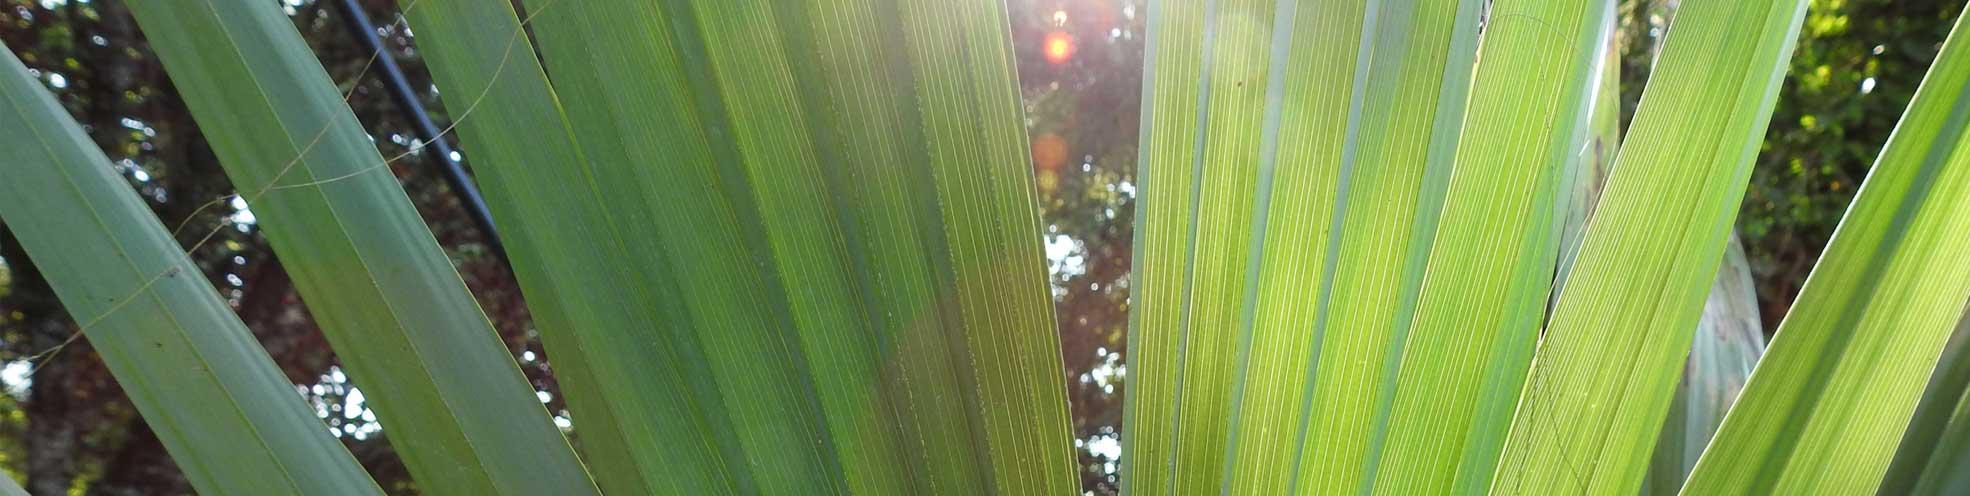 palmier chez ninjacoconut